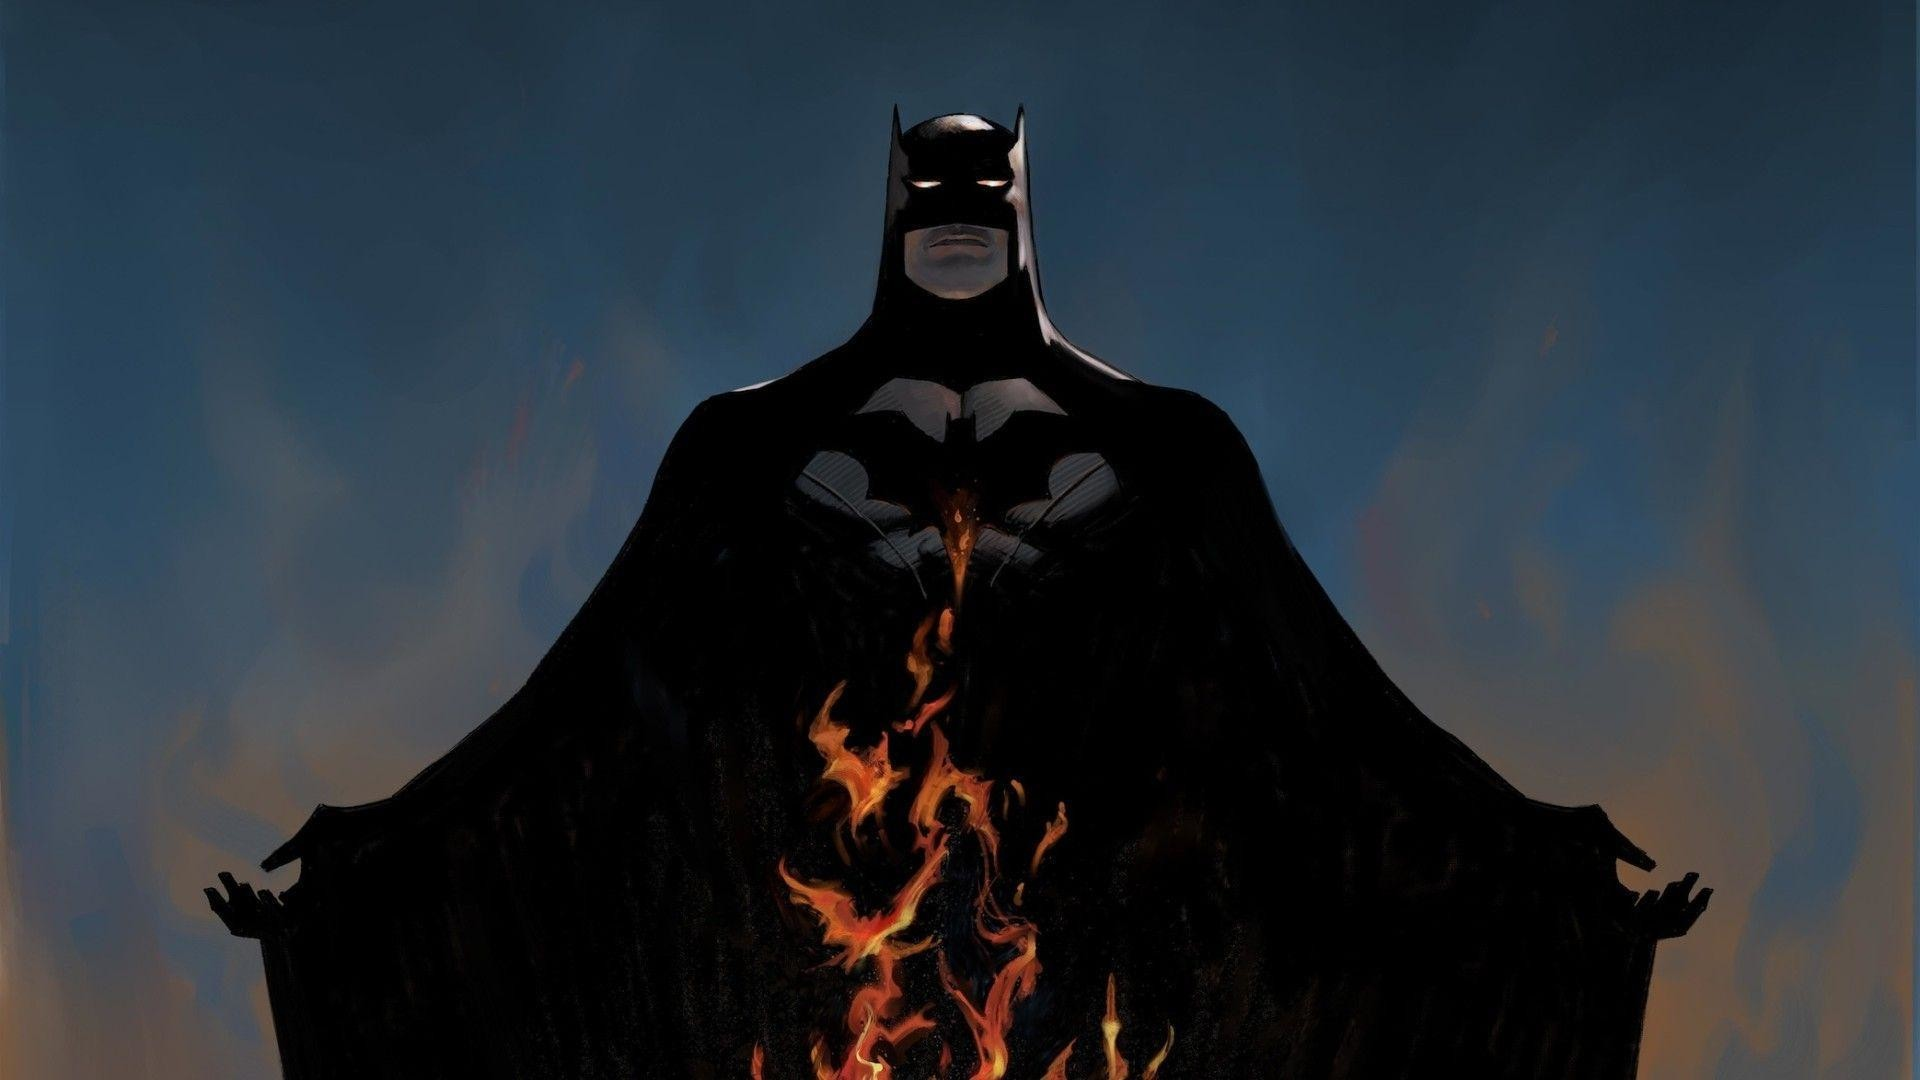 Wallpapers of Batman or Dark Knight a DC comic figur in HD